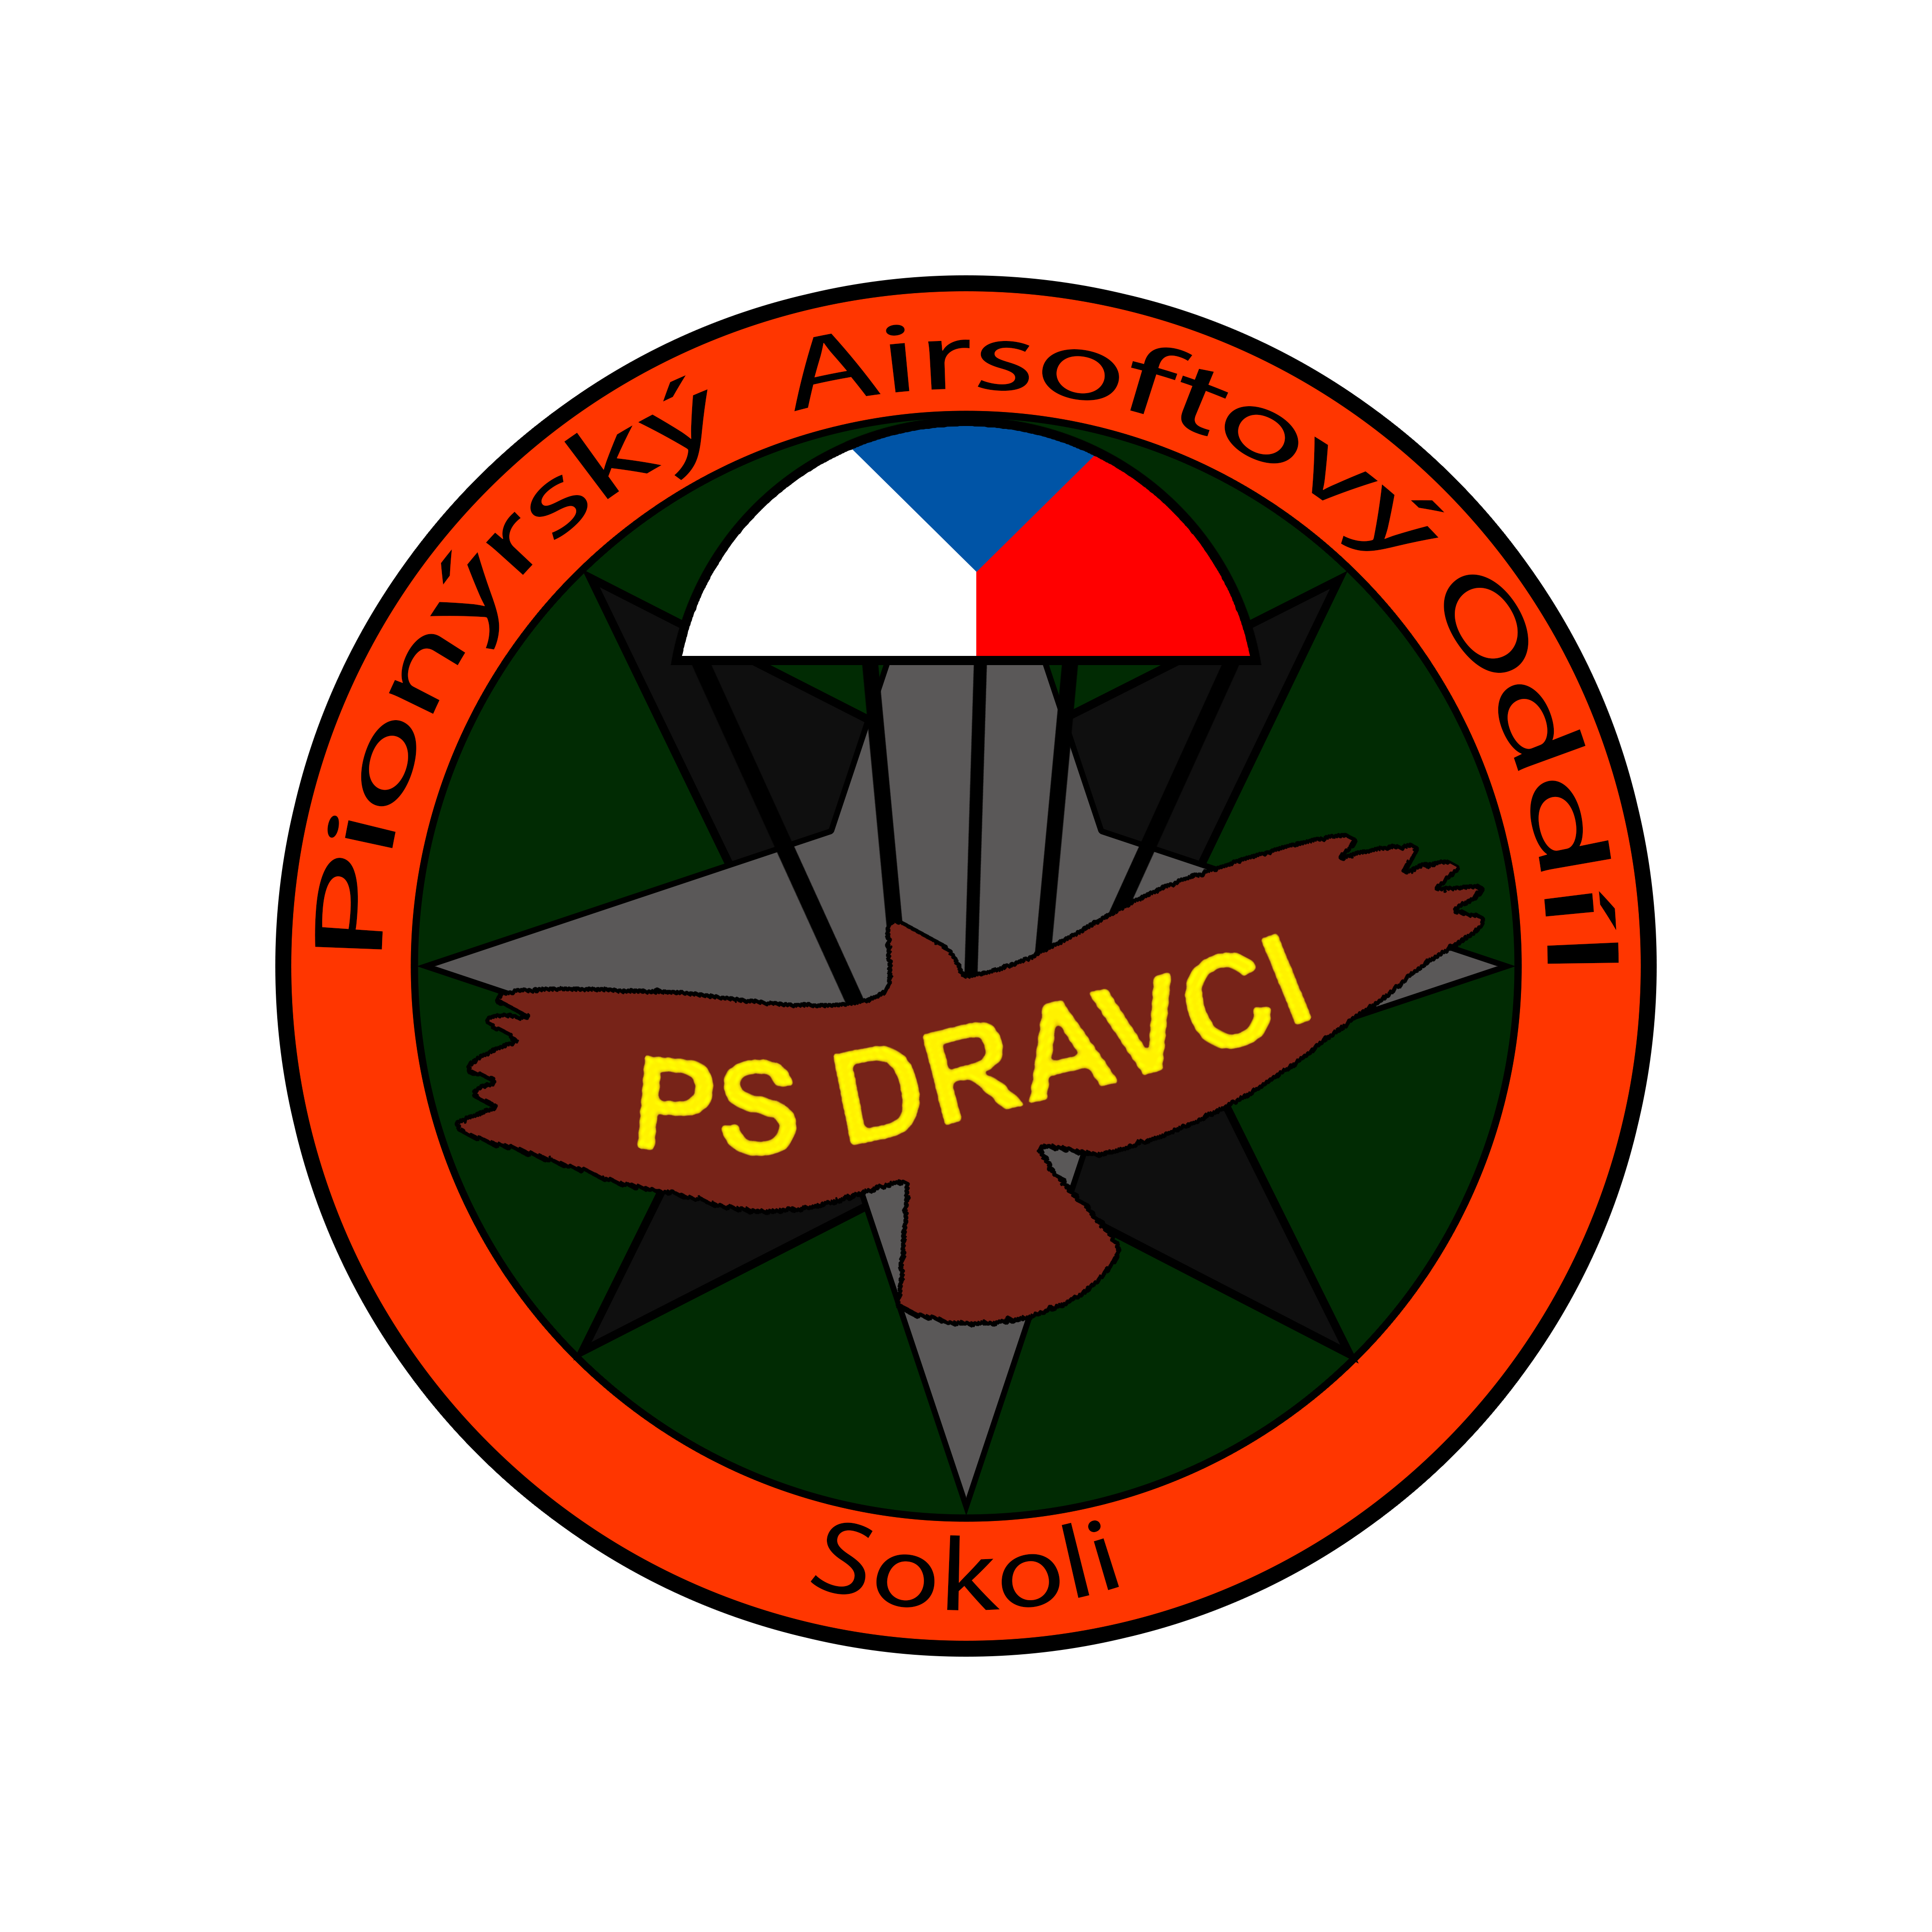 Airsoftovy oddil Sokoli